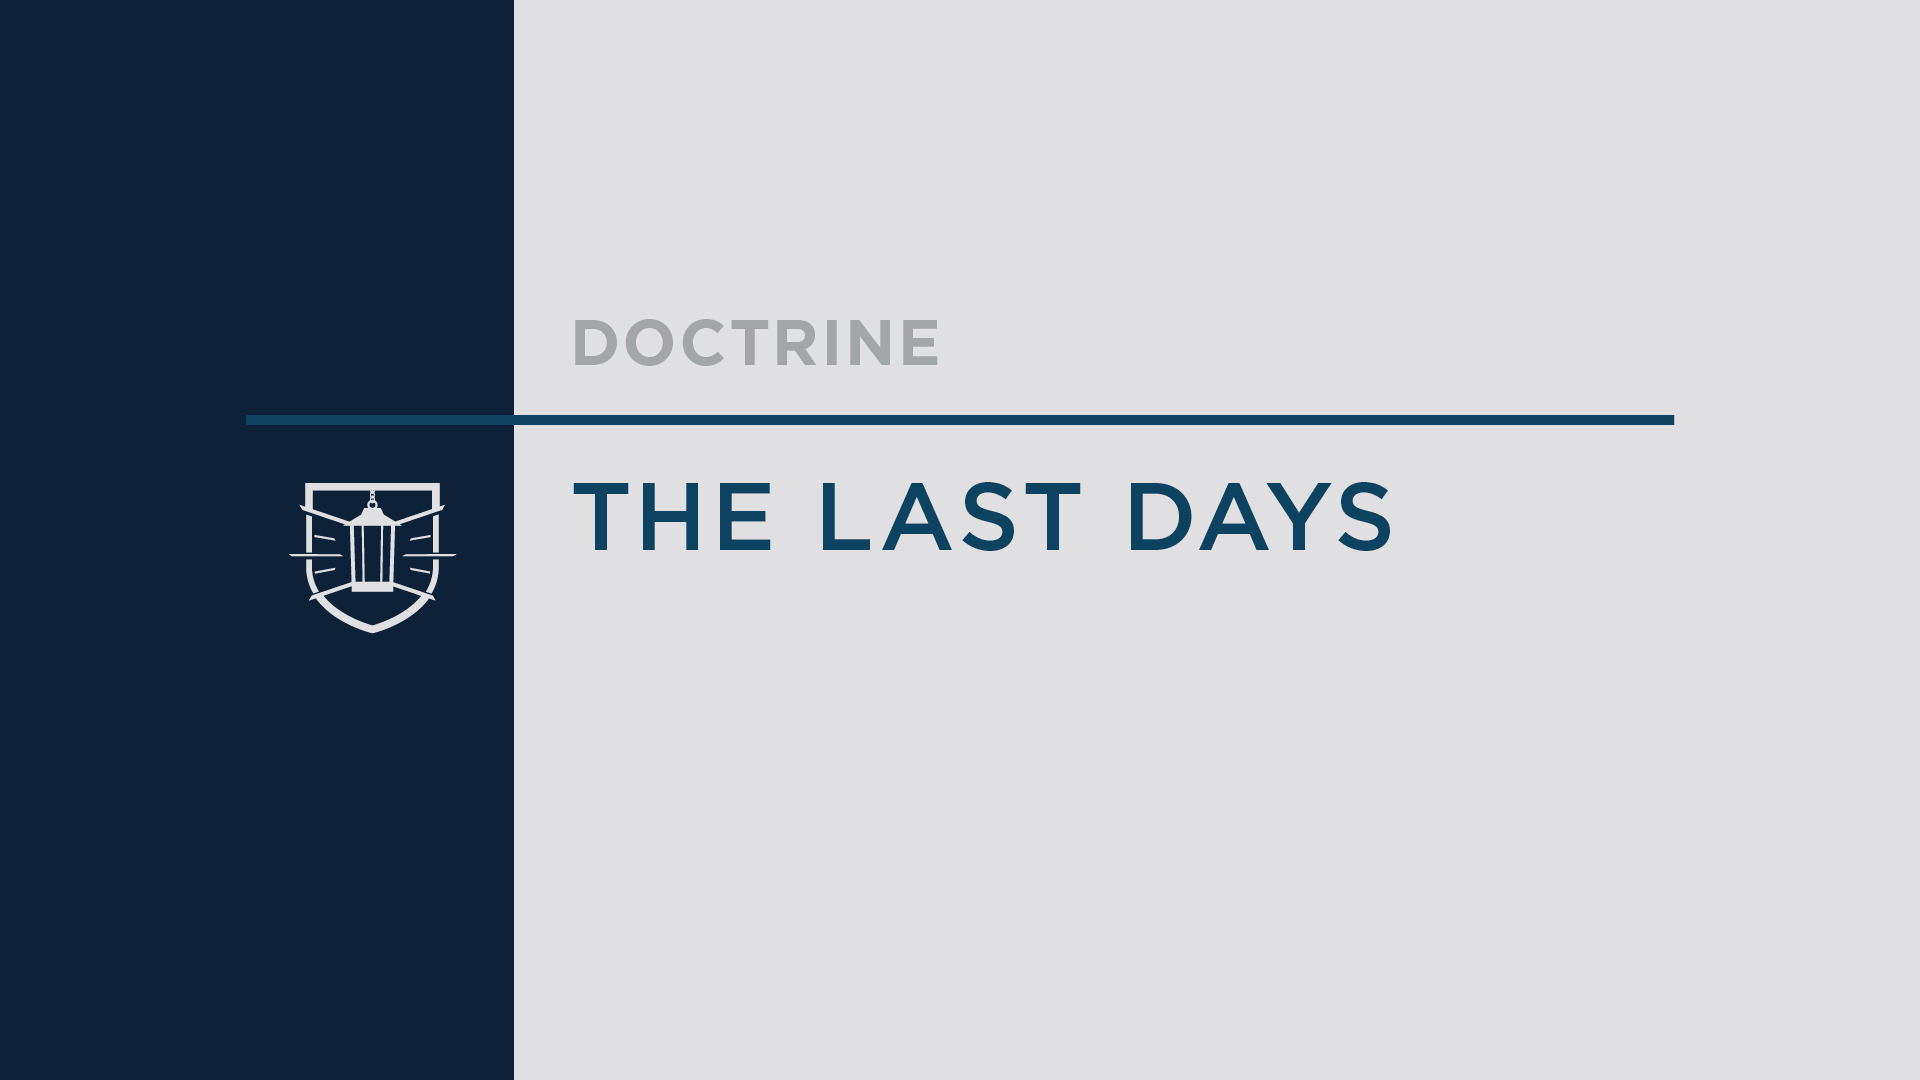 Doctrine 10: The Last Days